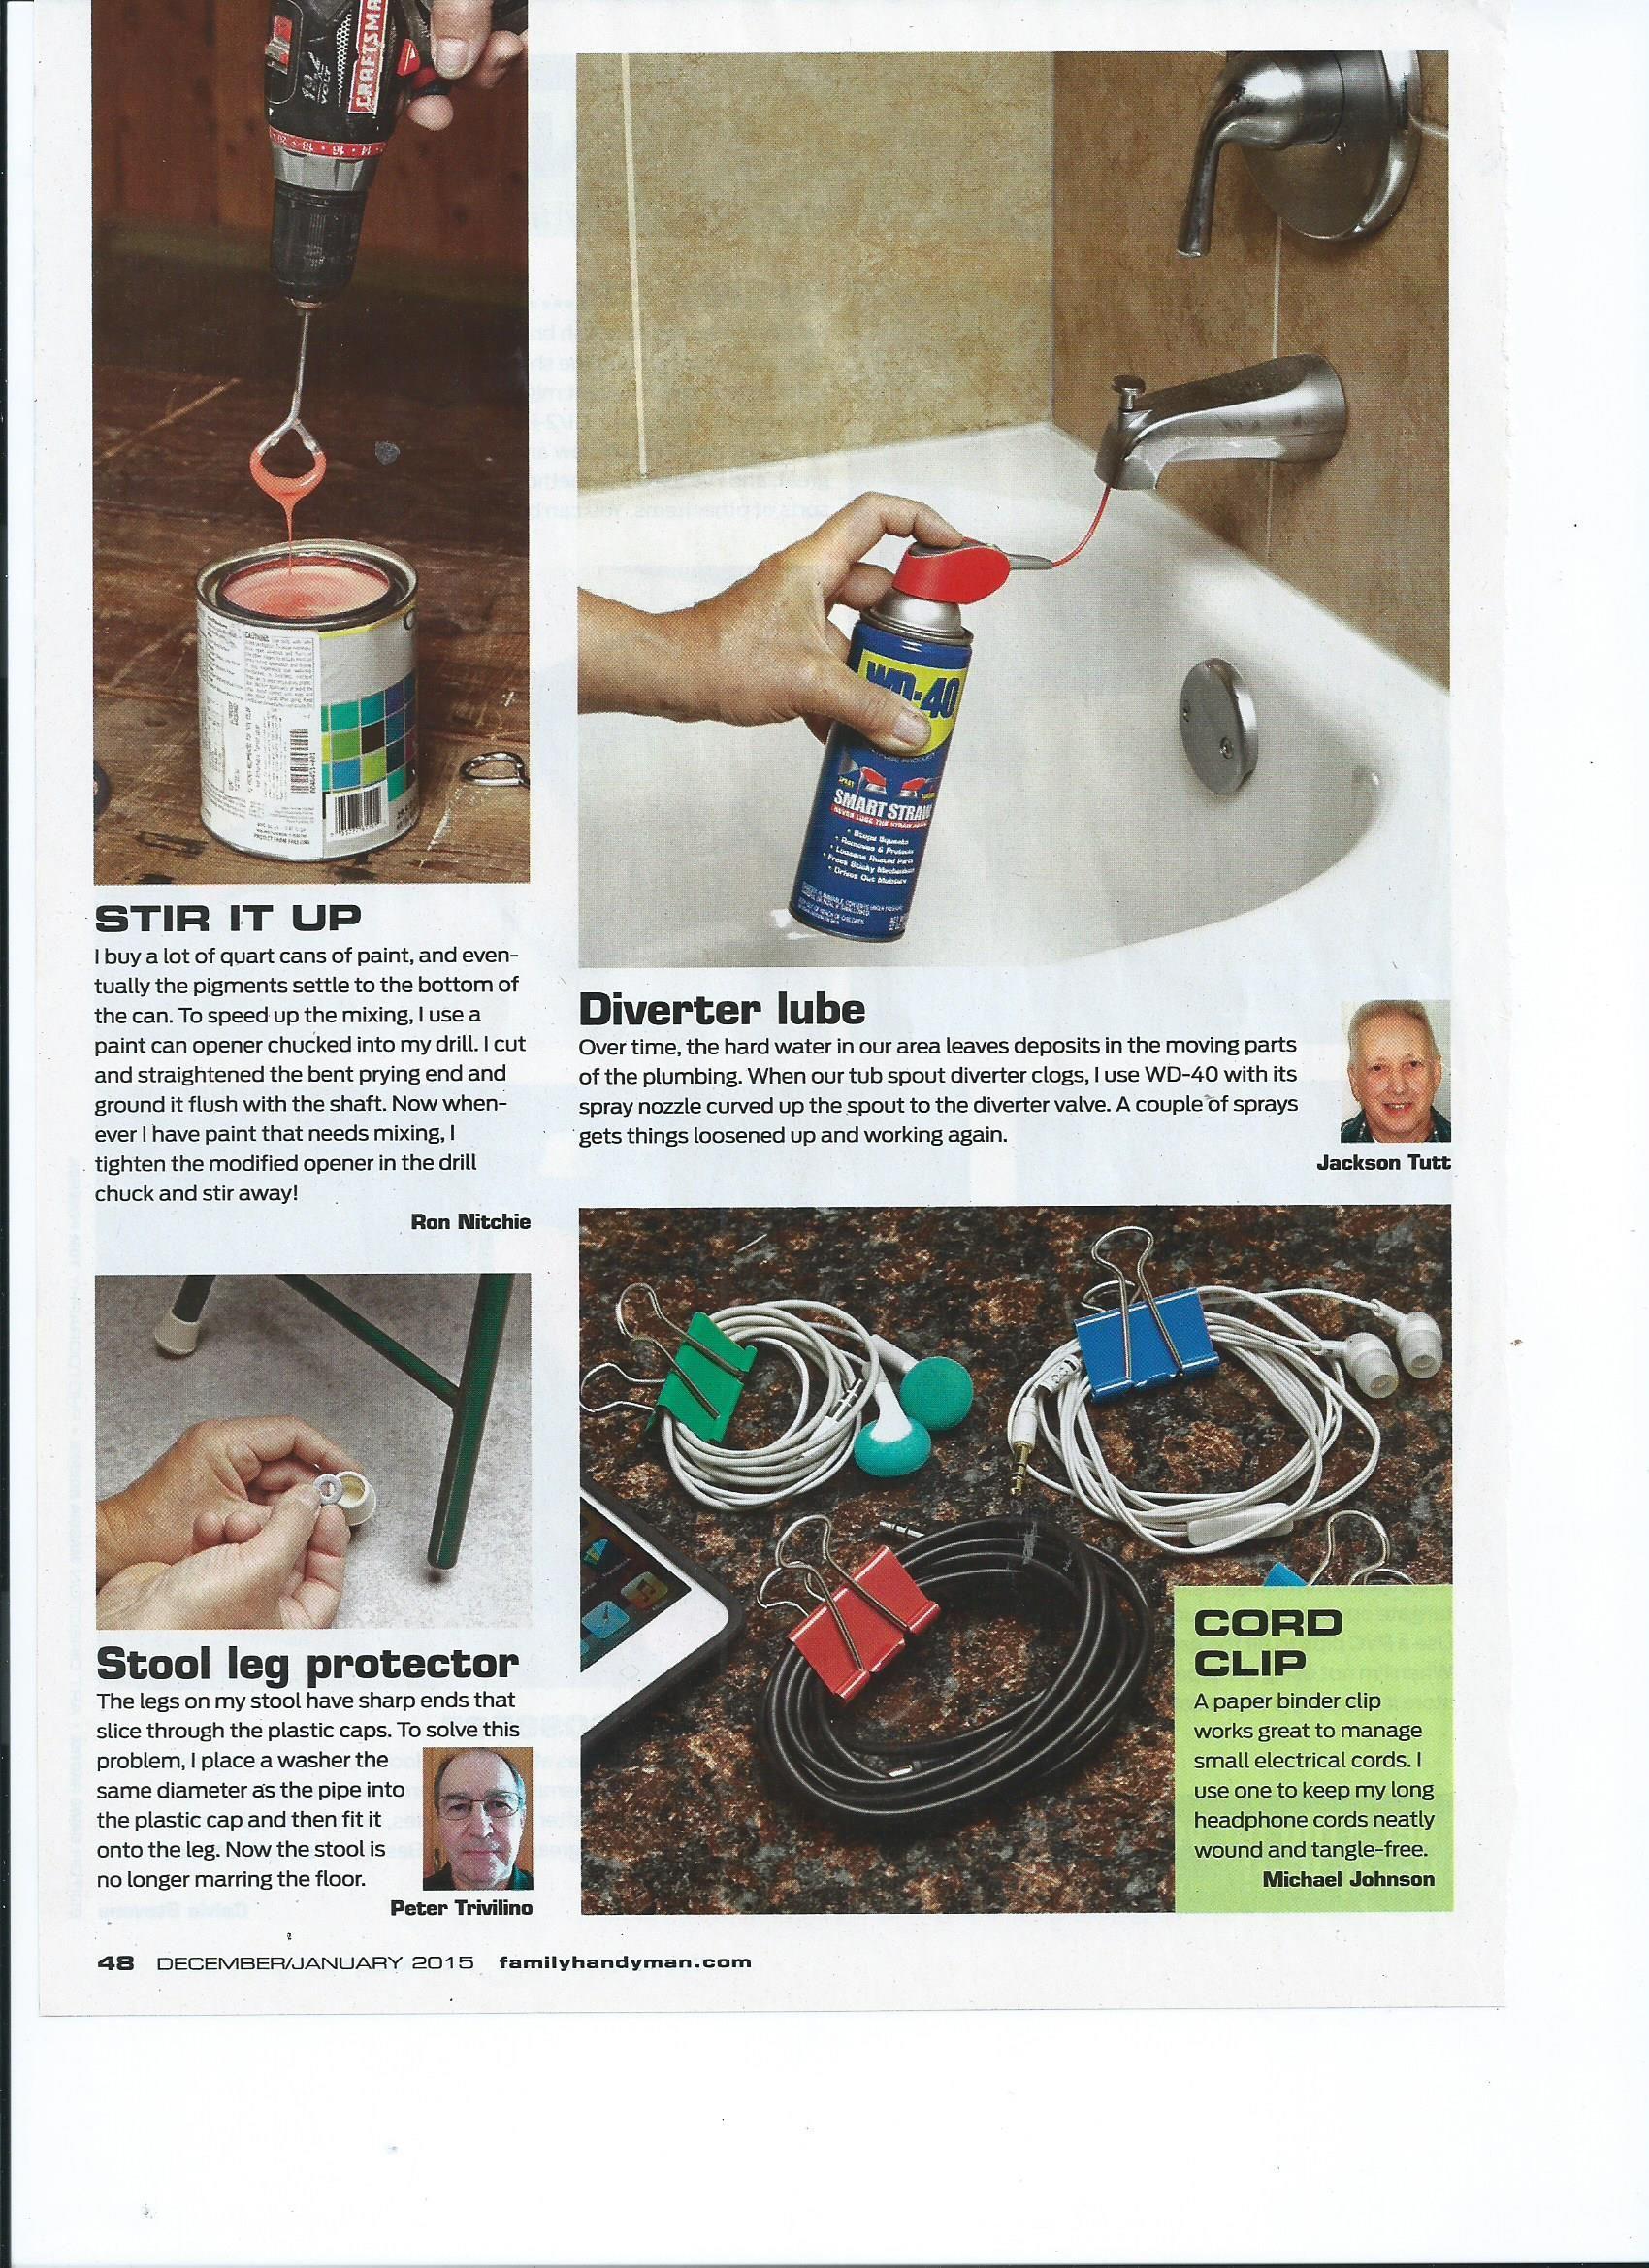 stir it up - diverter lube - stool leg protector - cord clip